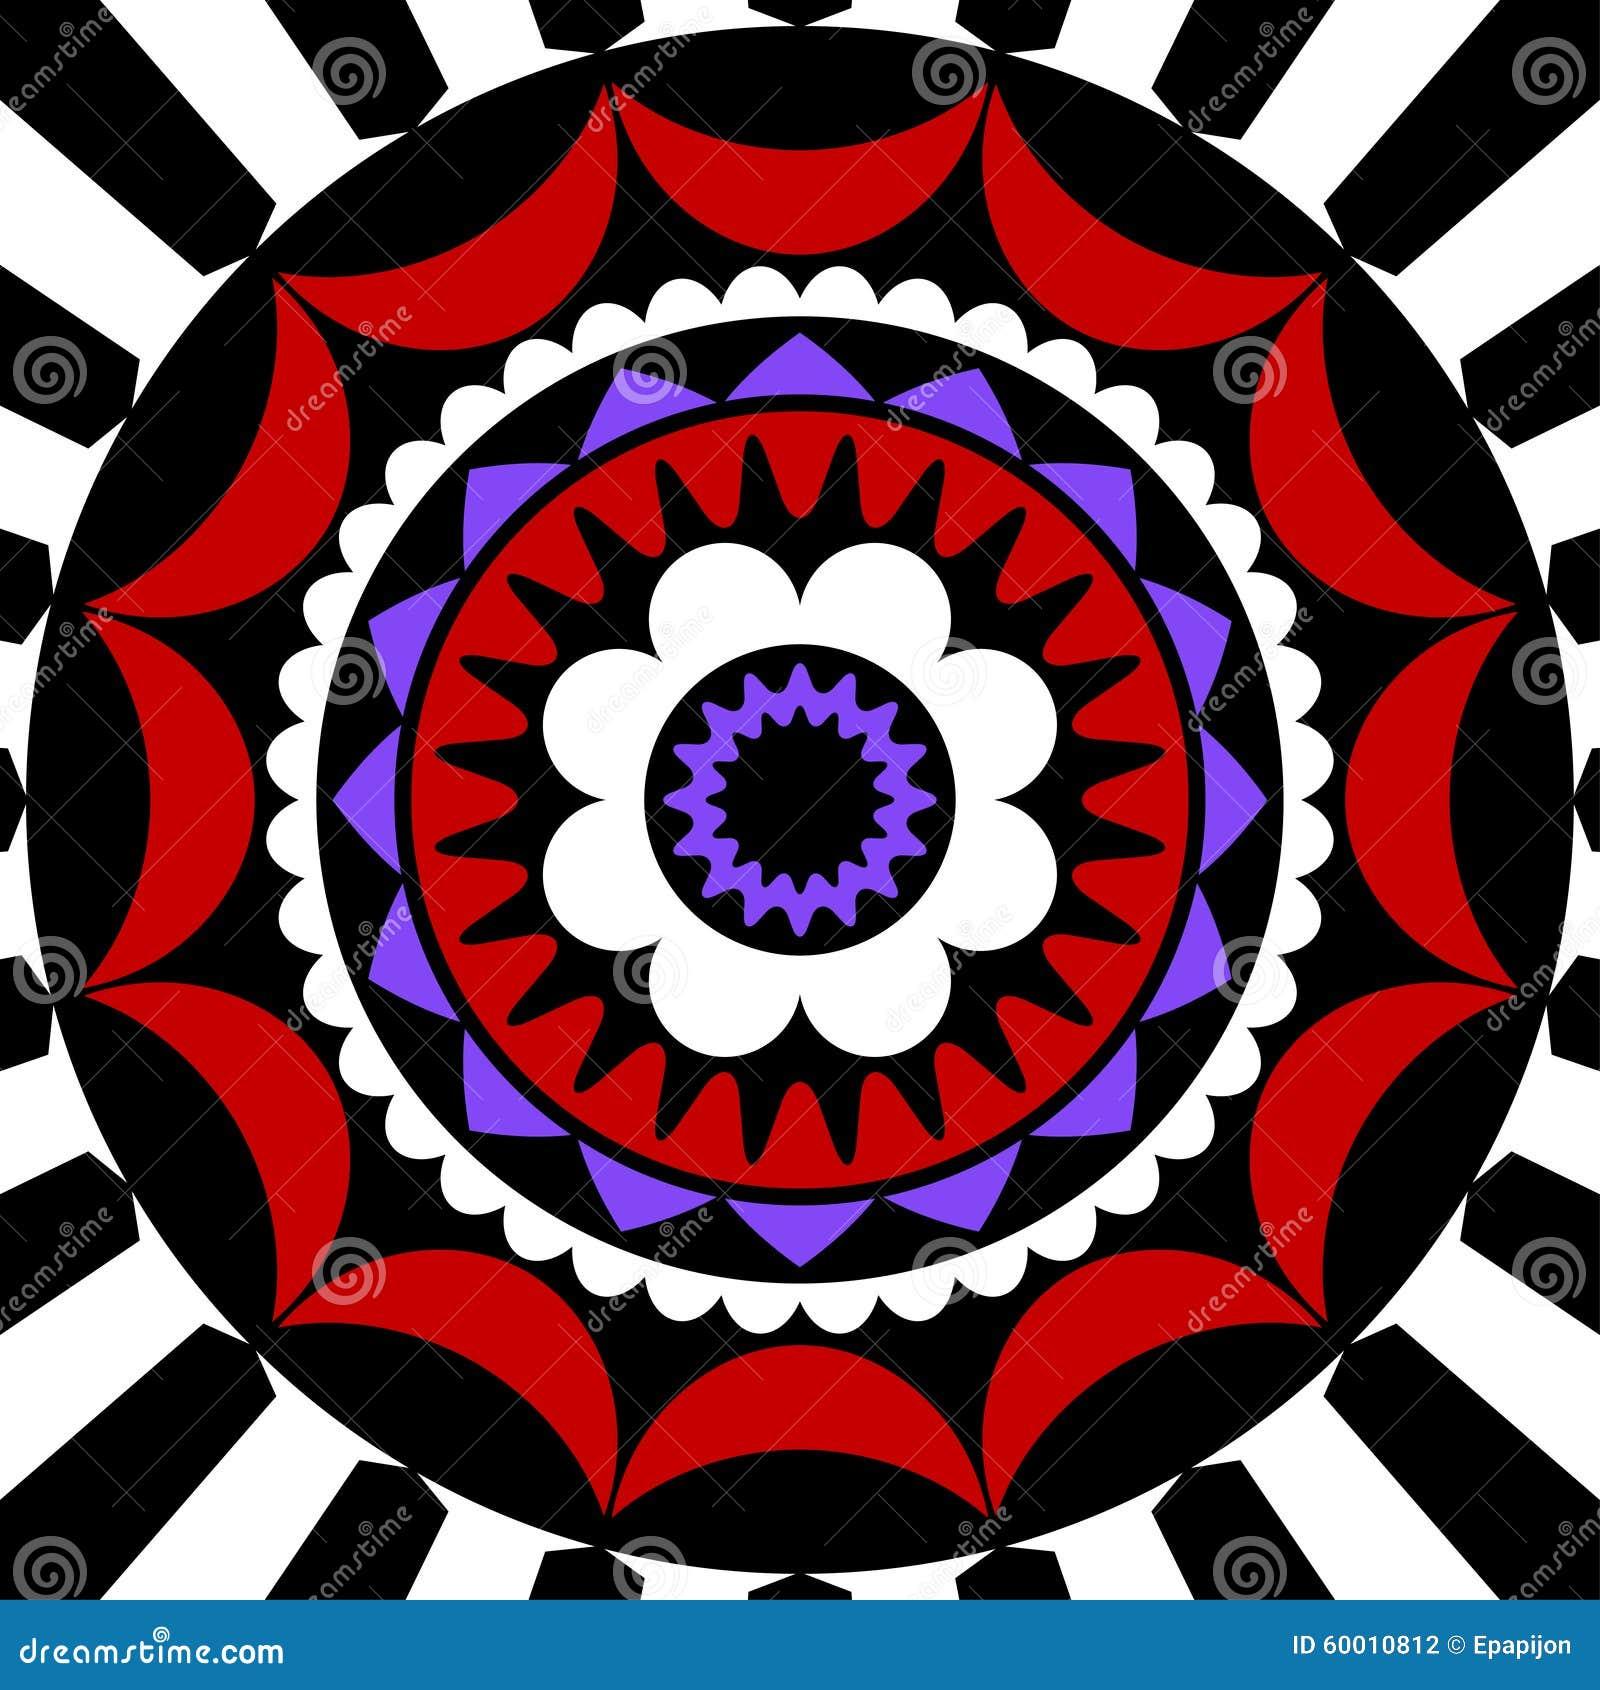 mandala rouge pourpre blanc et noir illustration de. Black Bedroom Furniture Sets. Home Design Ideas